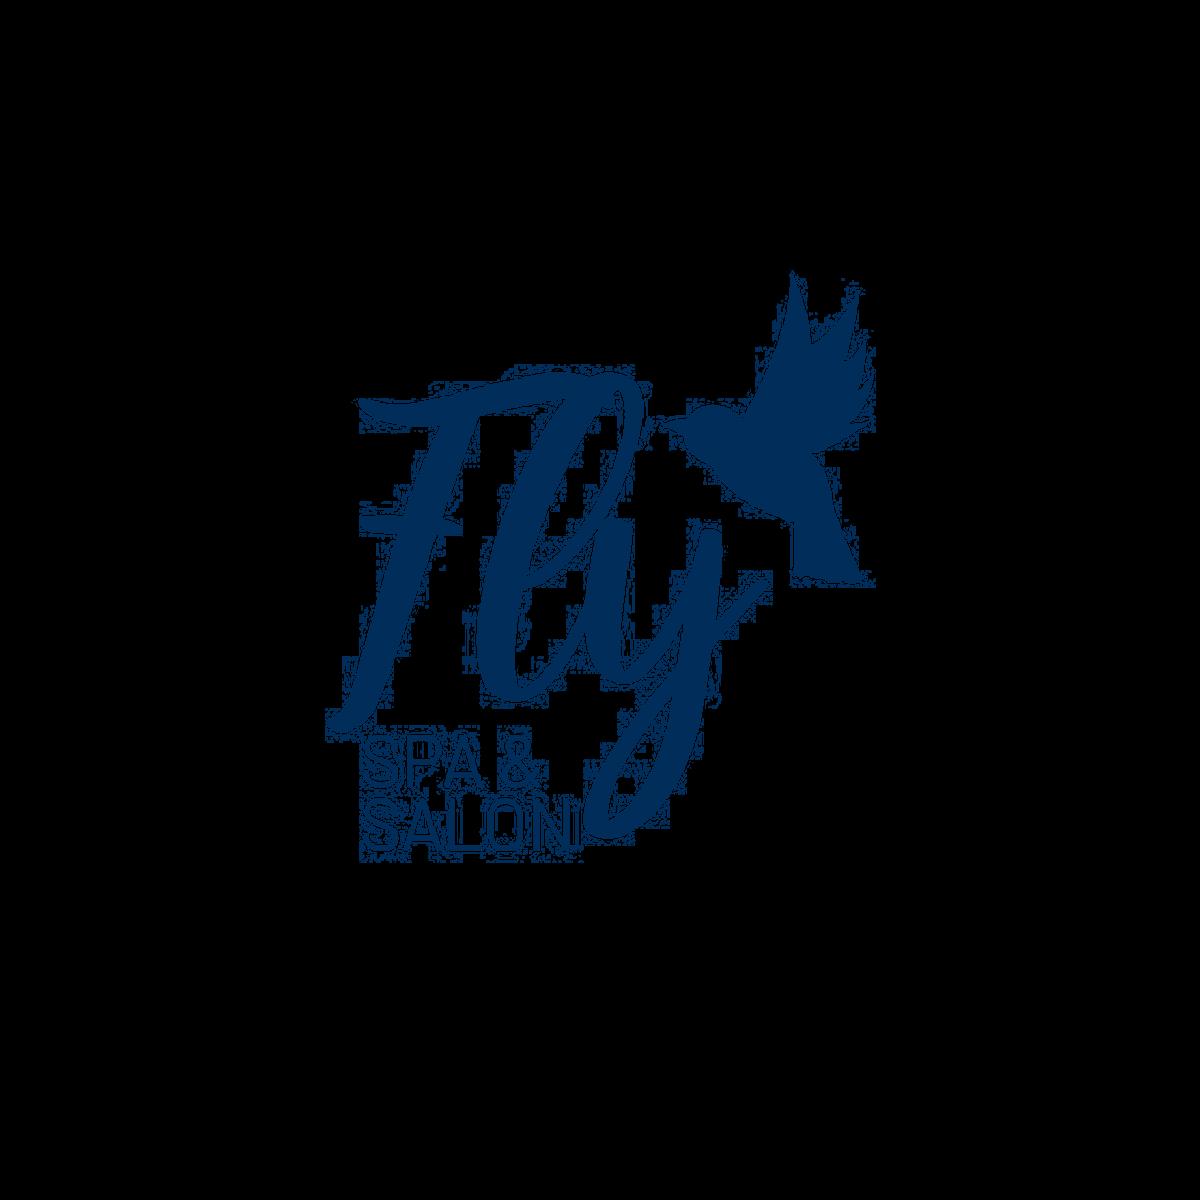 Fly blue logo